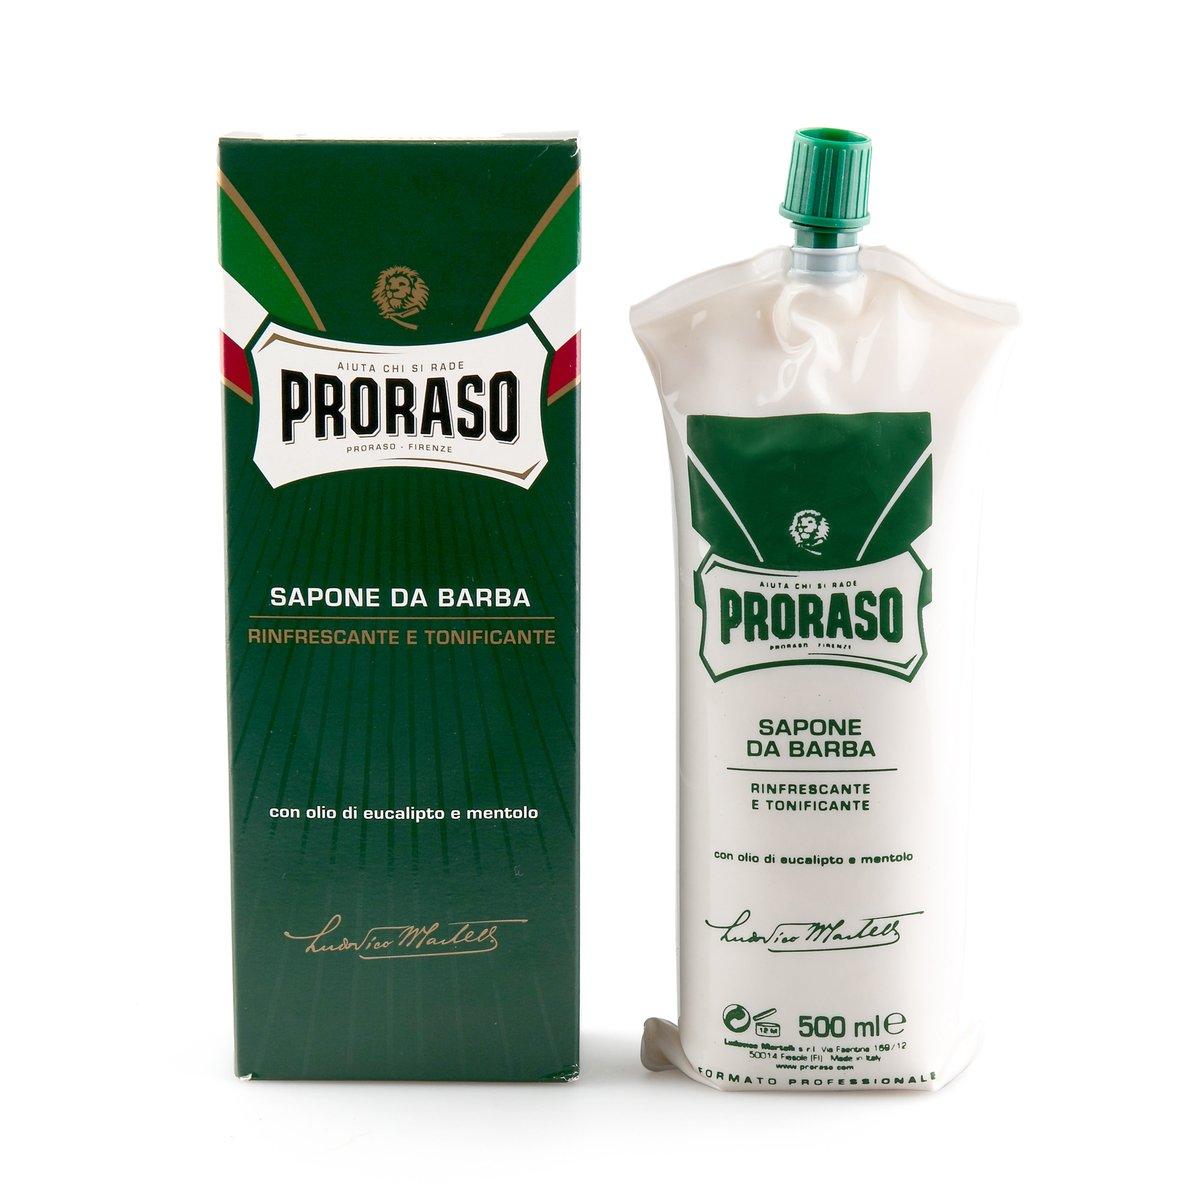 Proraso M&E Shaving Cream 500ml imagine produs